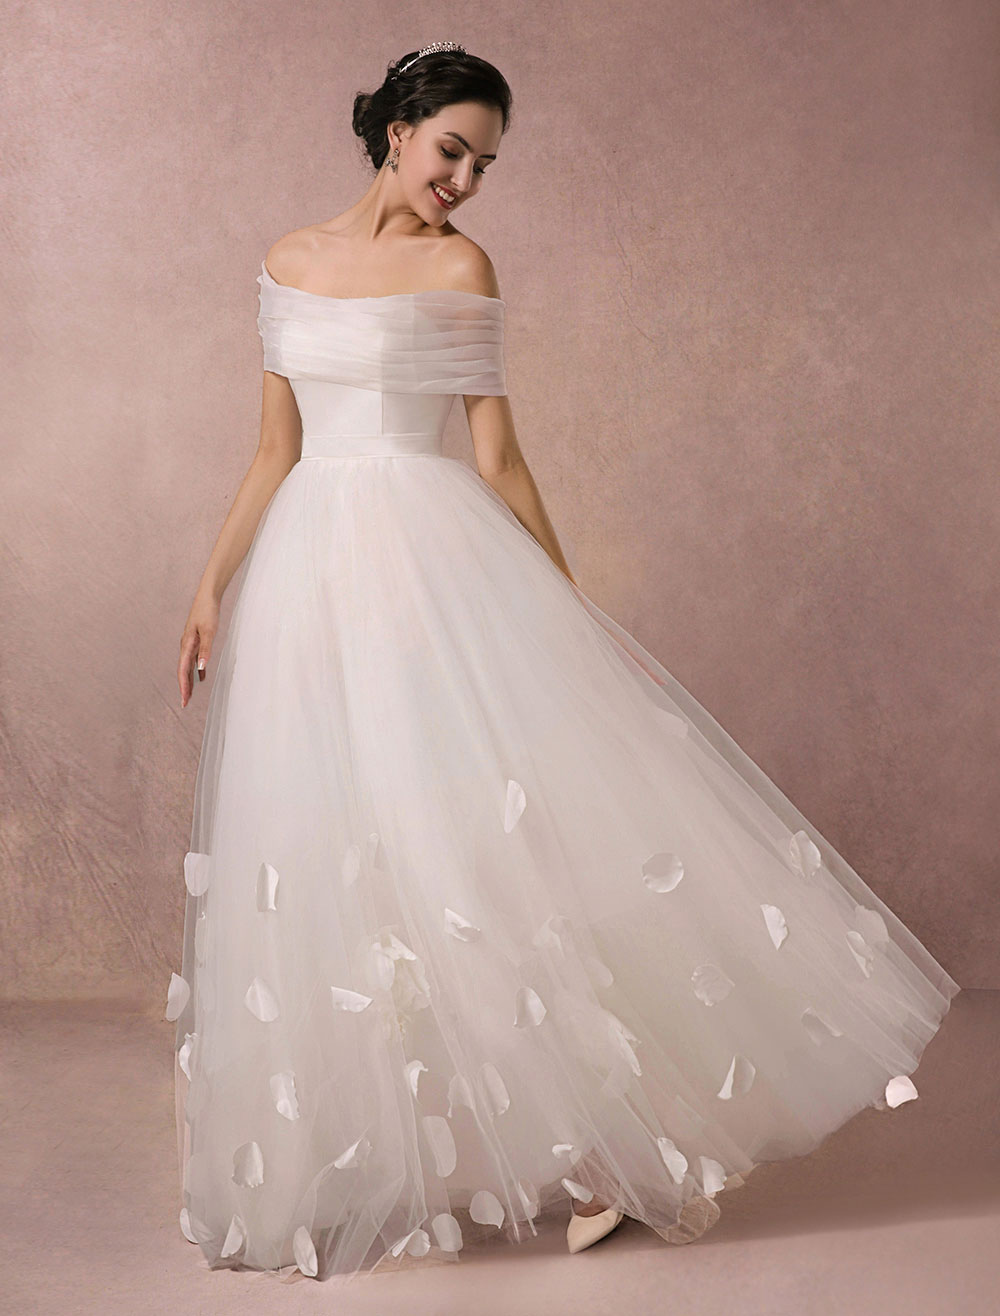 Tulle Wedding Dress Sweetheart Satin Bodice Petals Applique Floor-length A-line Bridal Gown Detachable Organza Wrap Beach Wedding Dress Milanoo